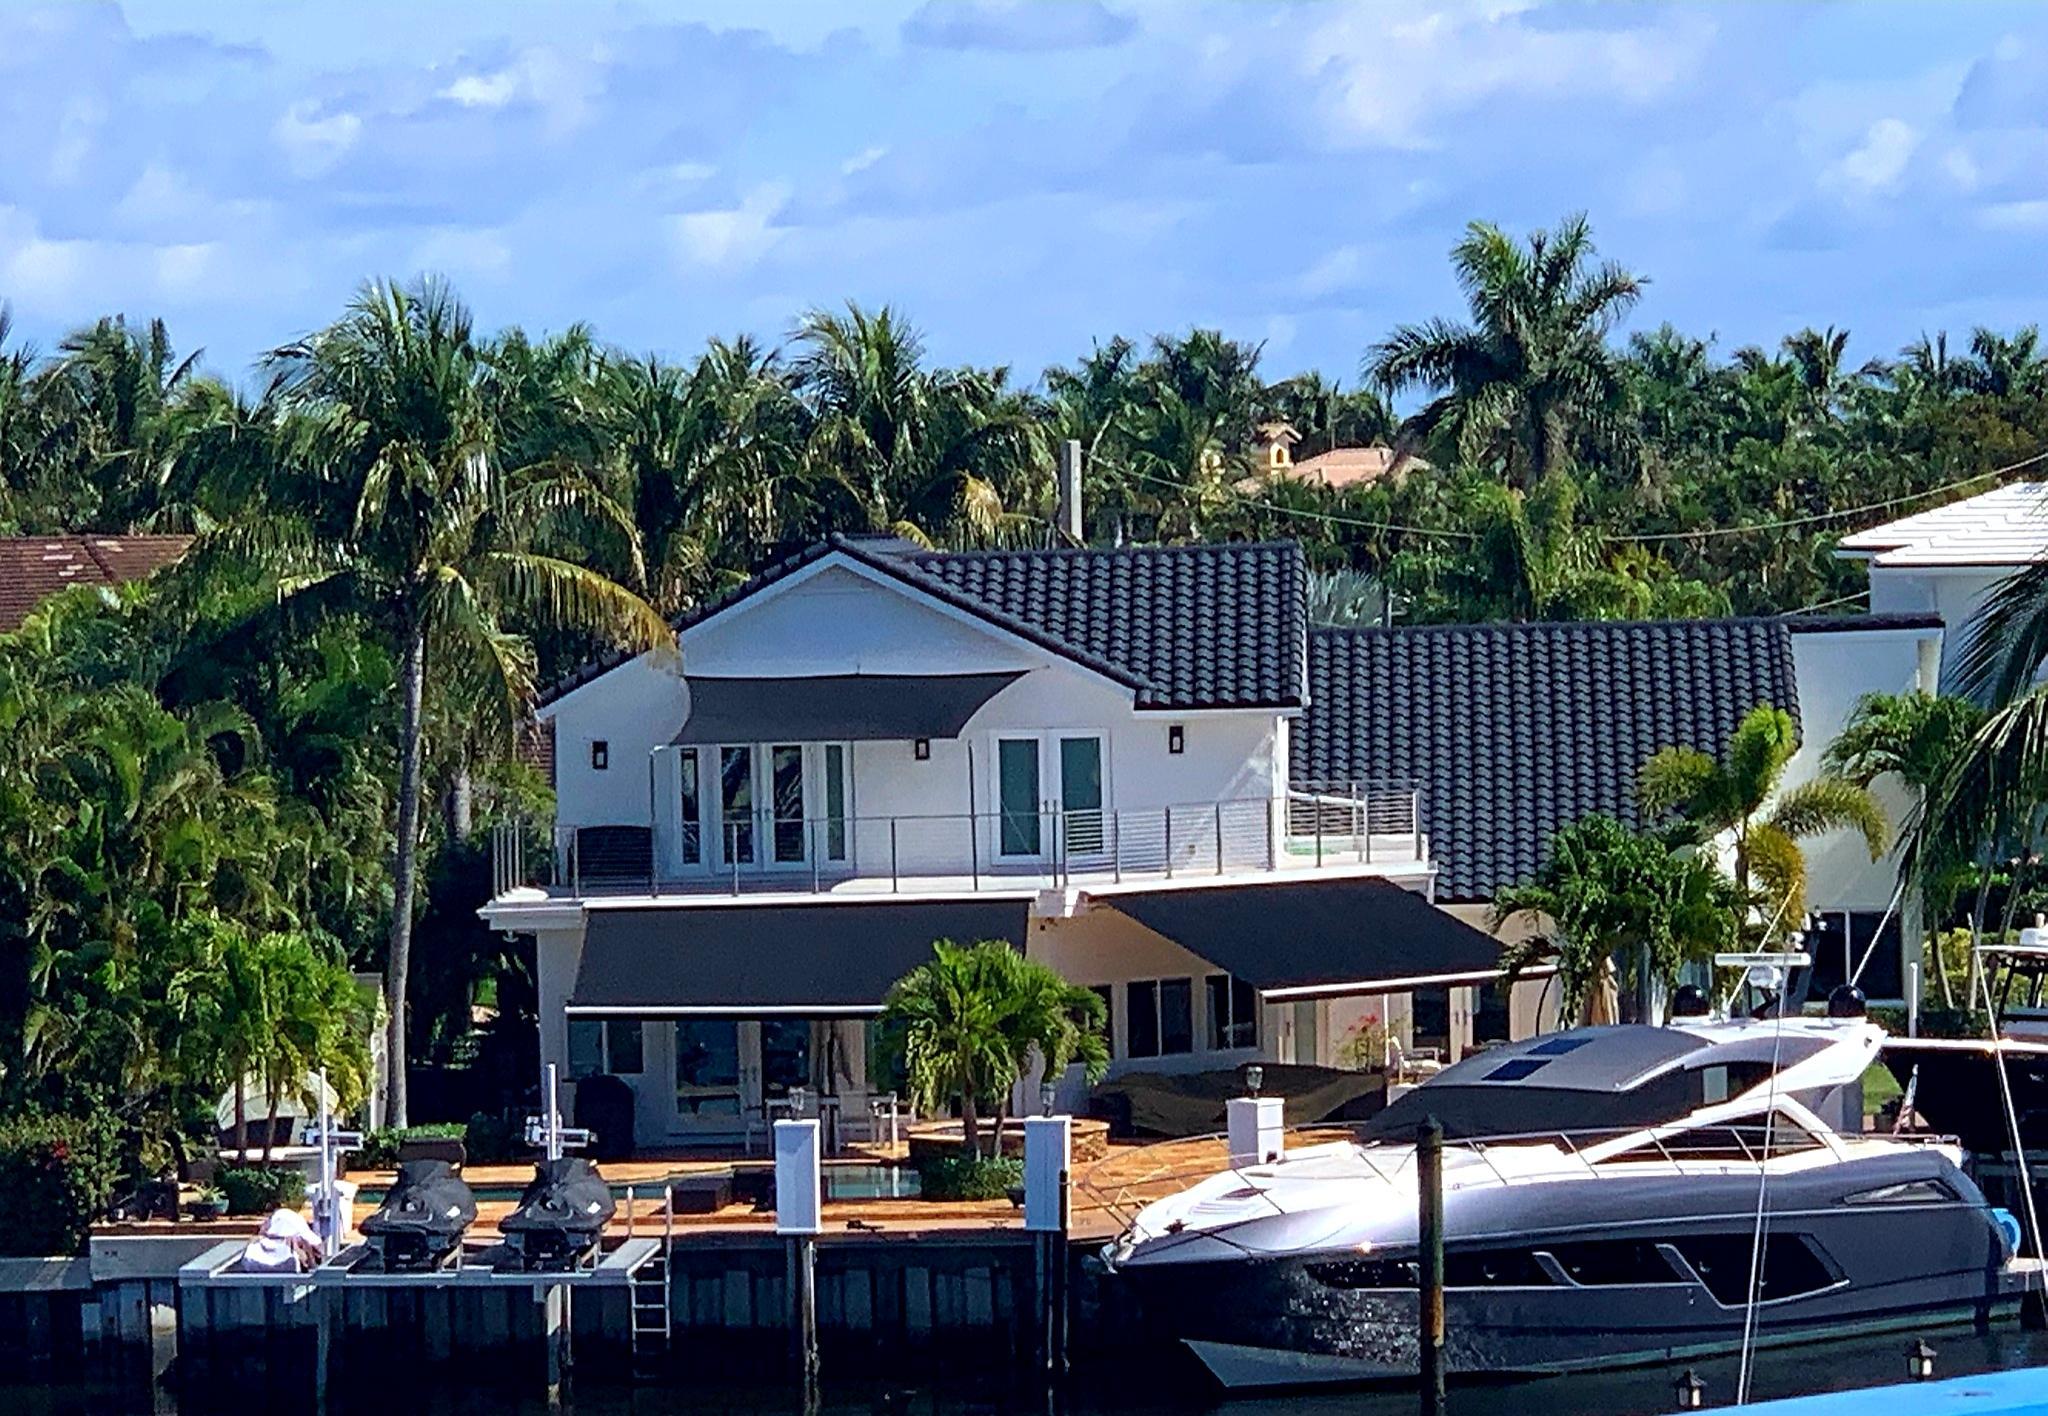 35 Ixora Way, Ocean Ridge, Florida 33435, 4 Bedrooms Bedrooms, ,4 BathroomsBathrooms,Single Family,For Sale,Ocean Ridge Beach,Ixora,RX-10507256